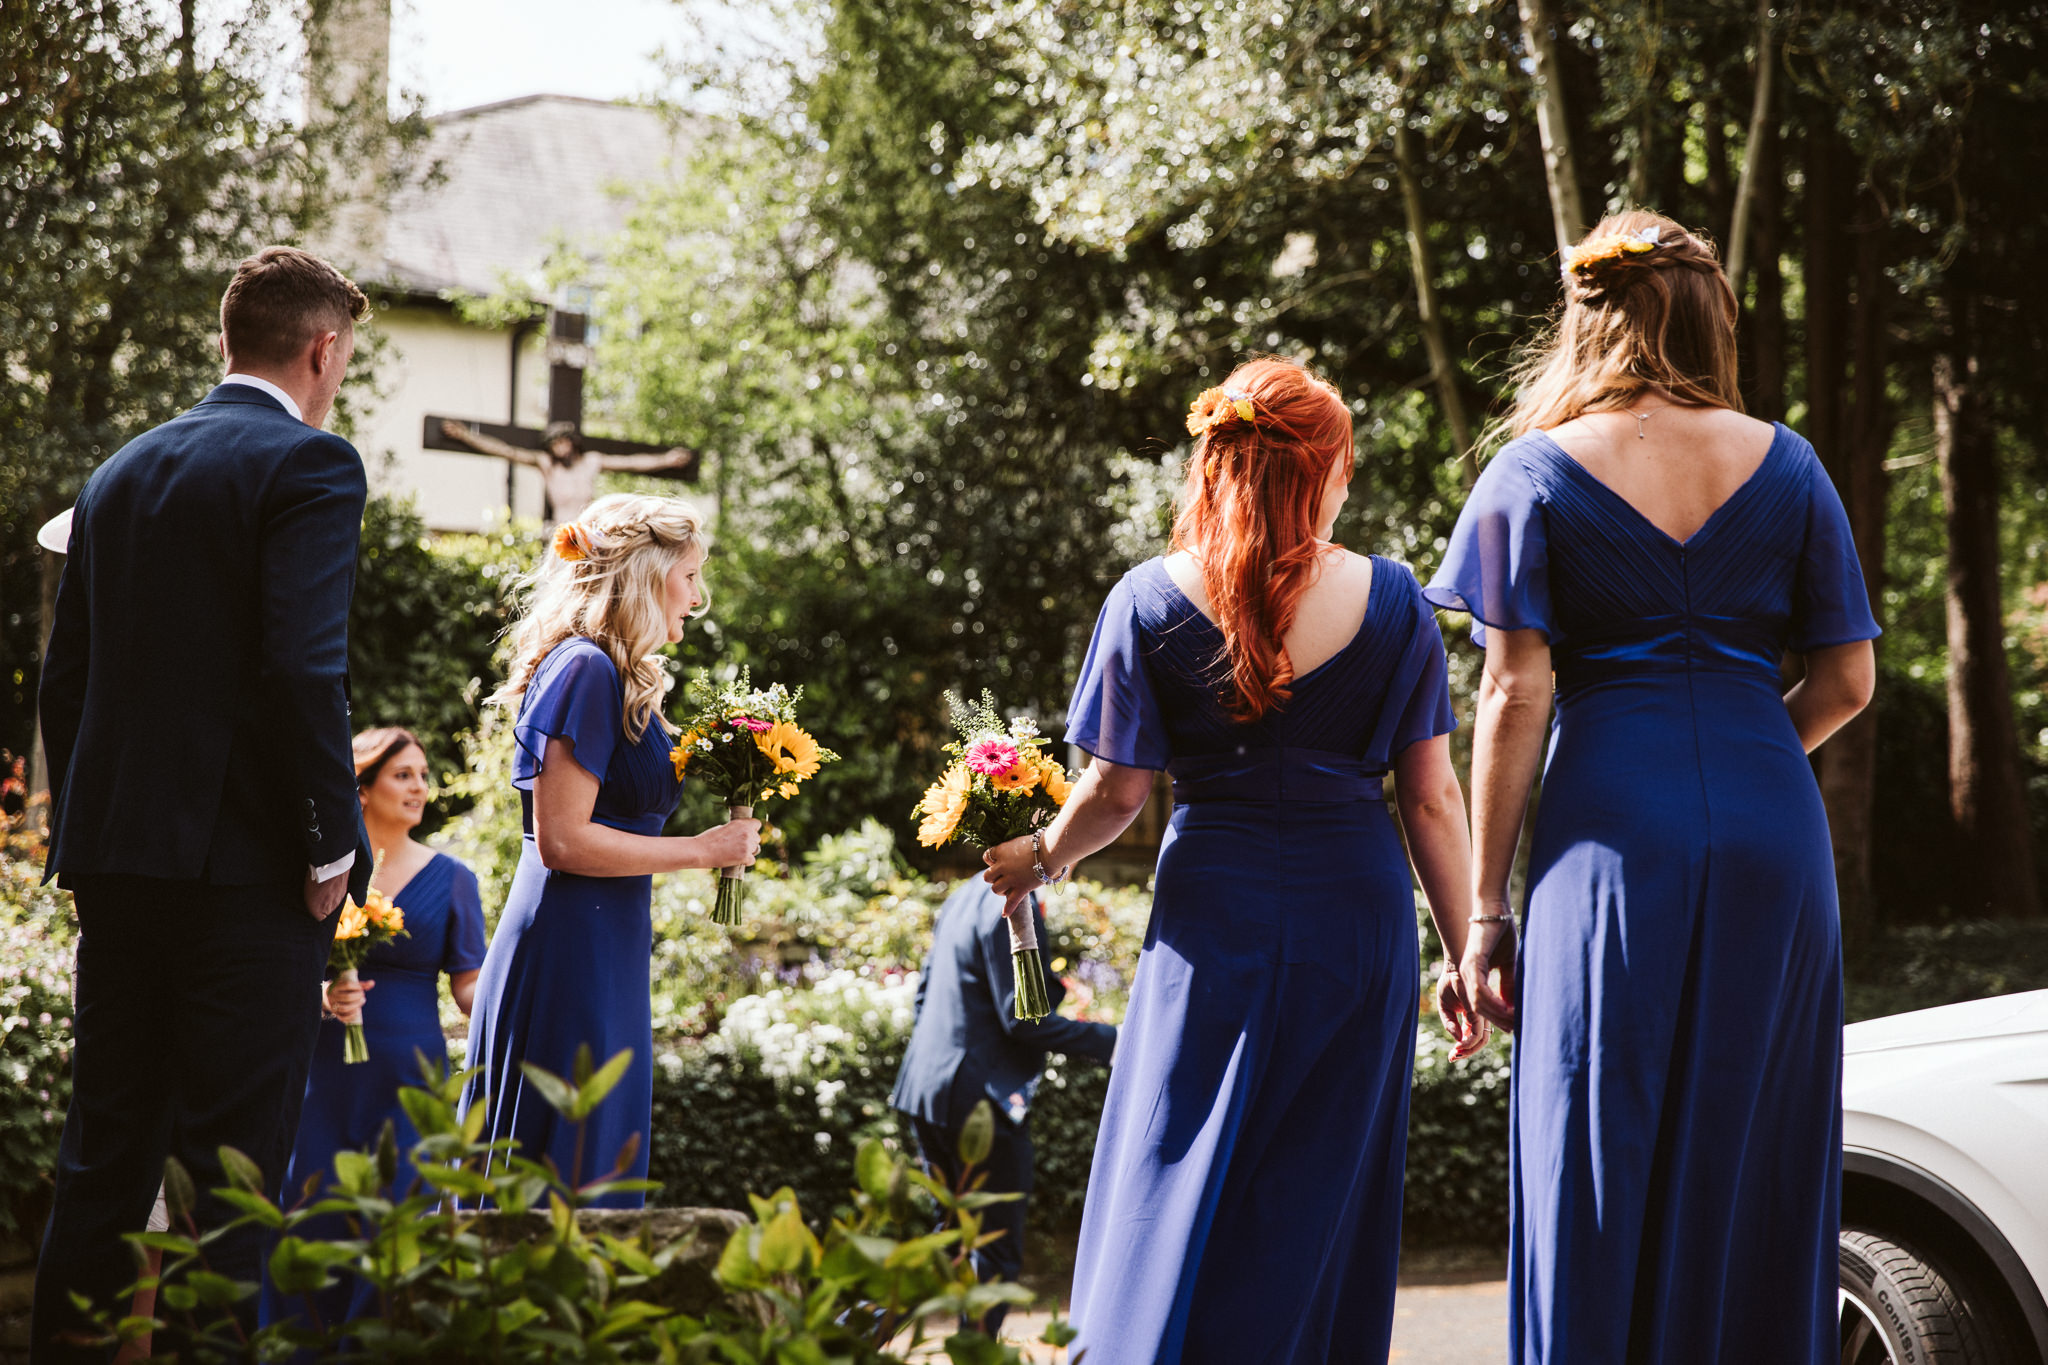 northside-farm-wedding-northumberland-margarita-hope (20).jpg